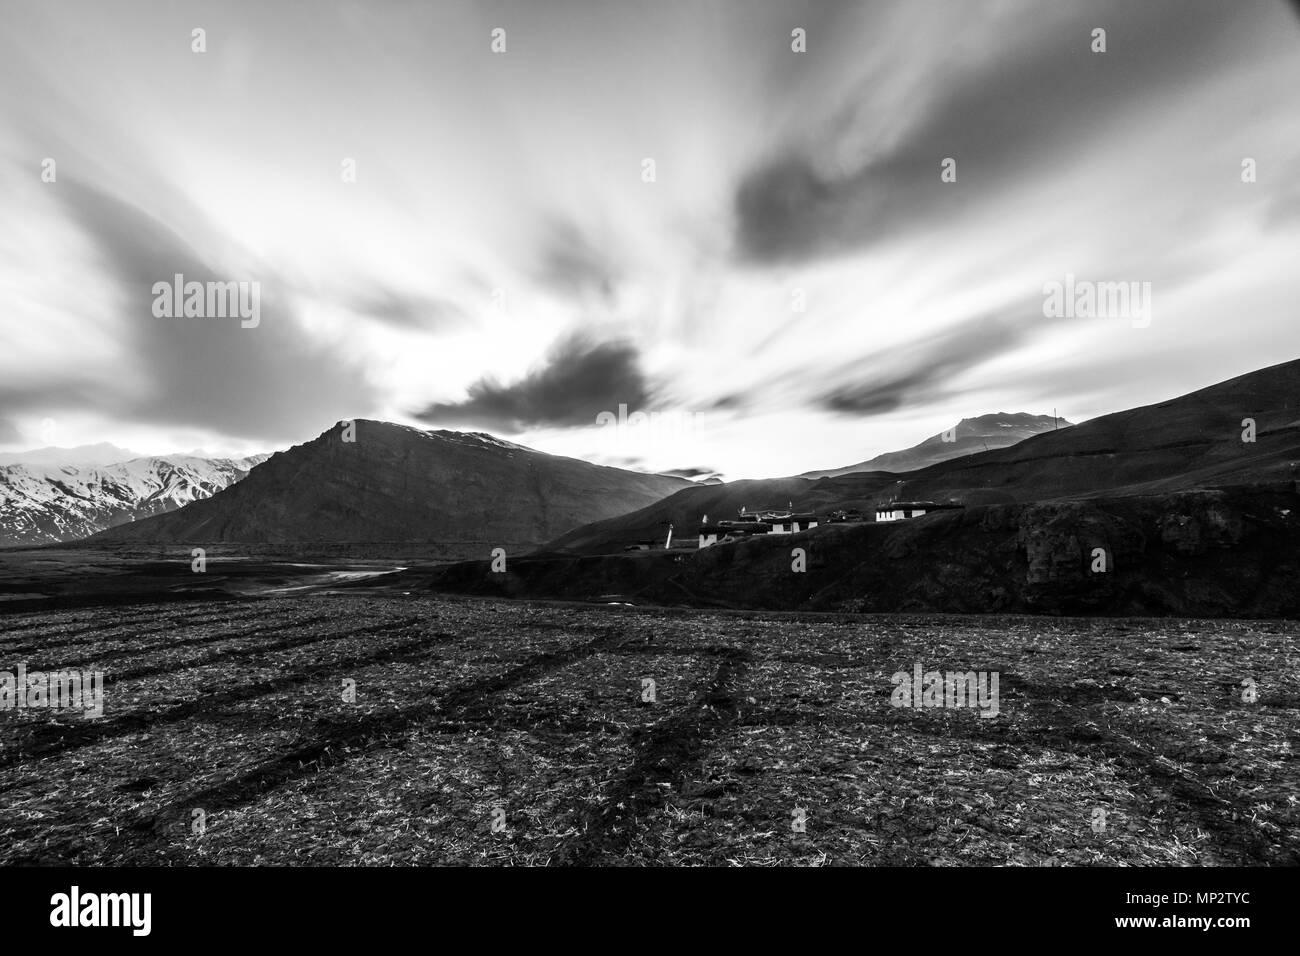 Sunset Long exposure in Langza - Spiti Stock Photo